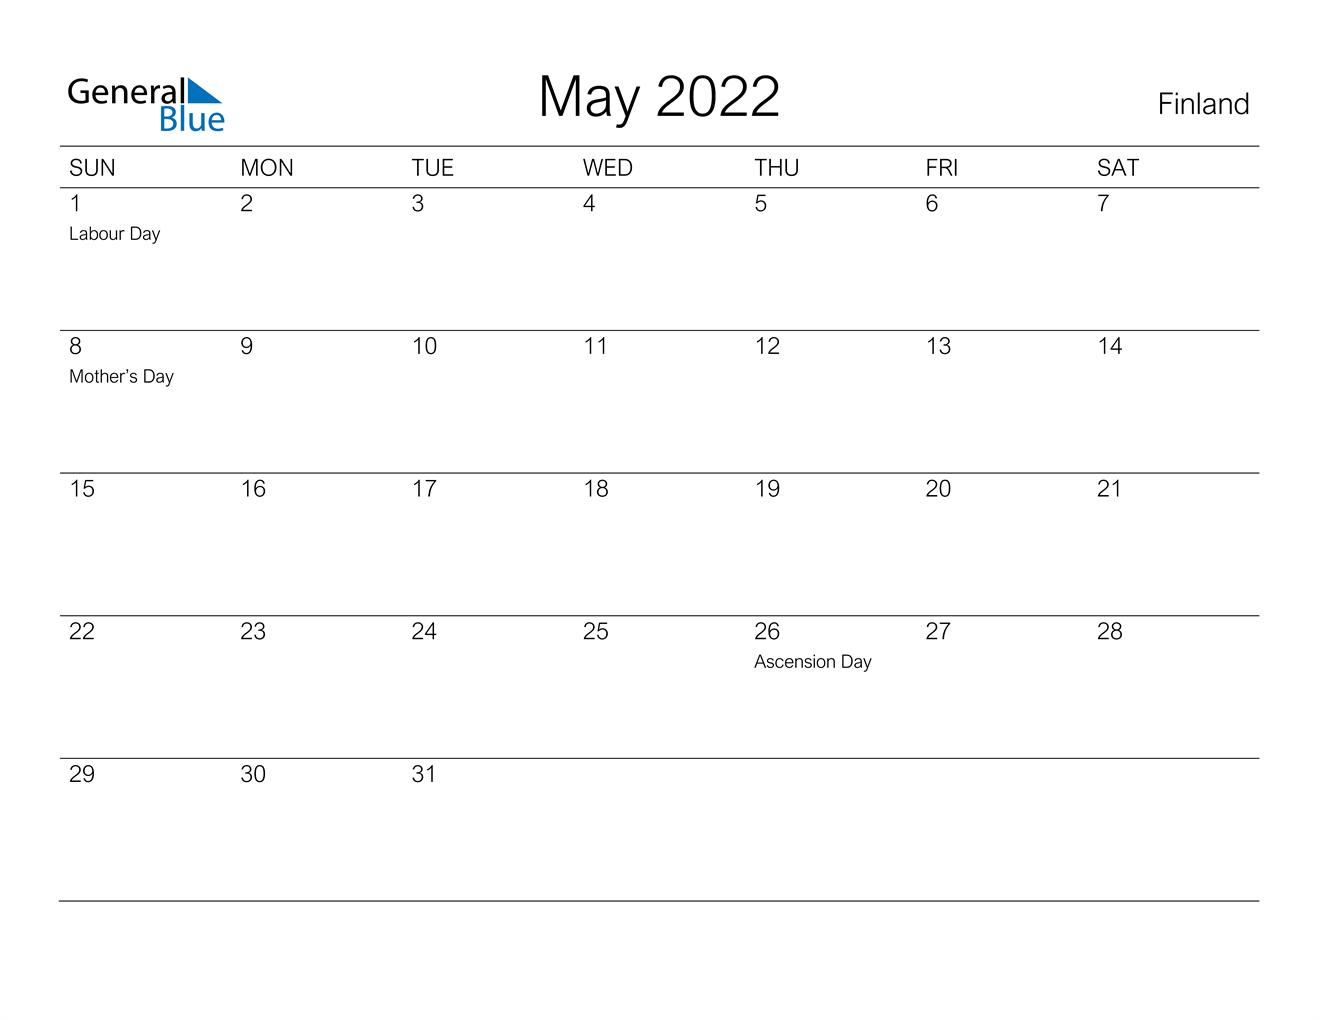 May 2022 Calendar - Finland